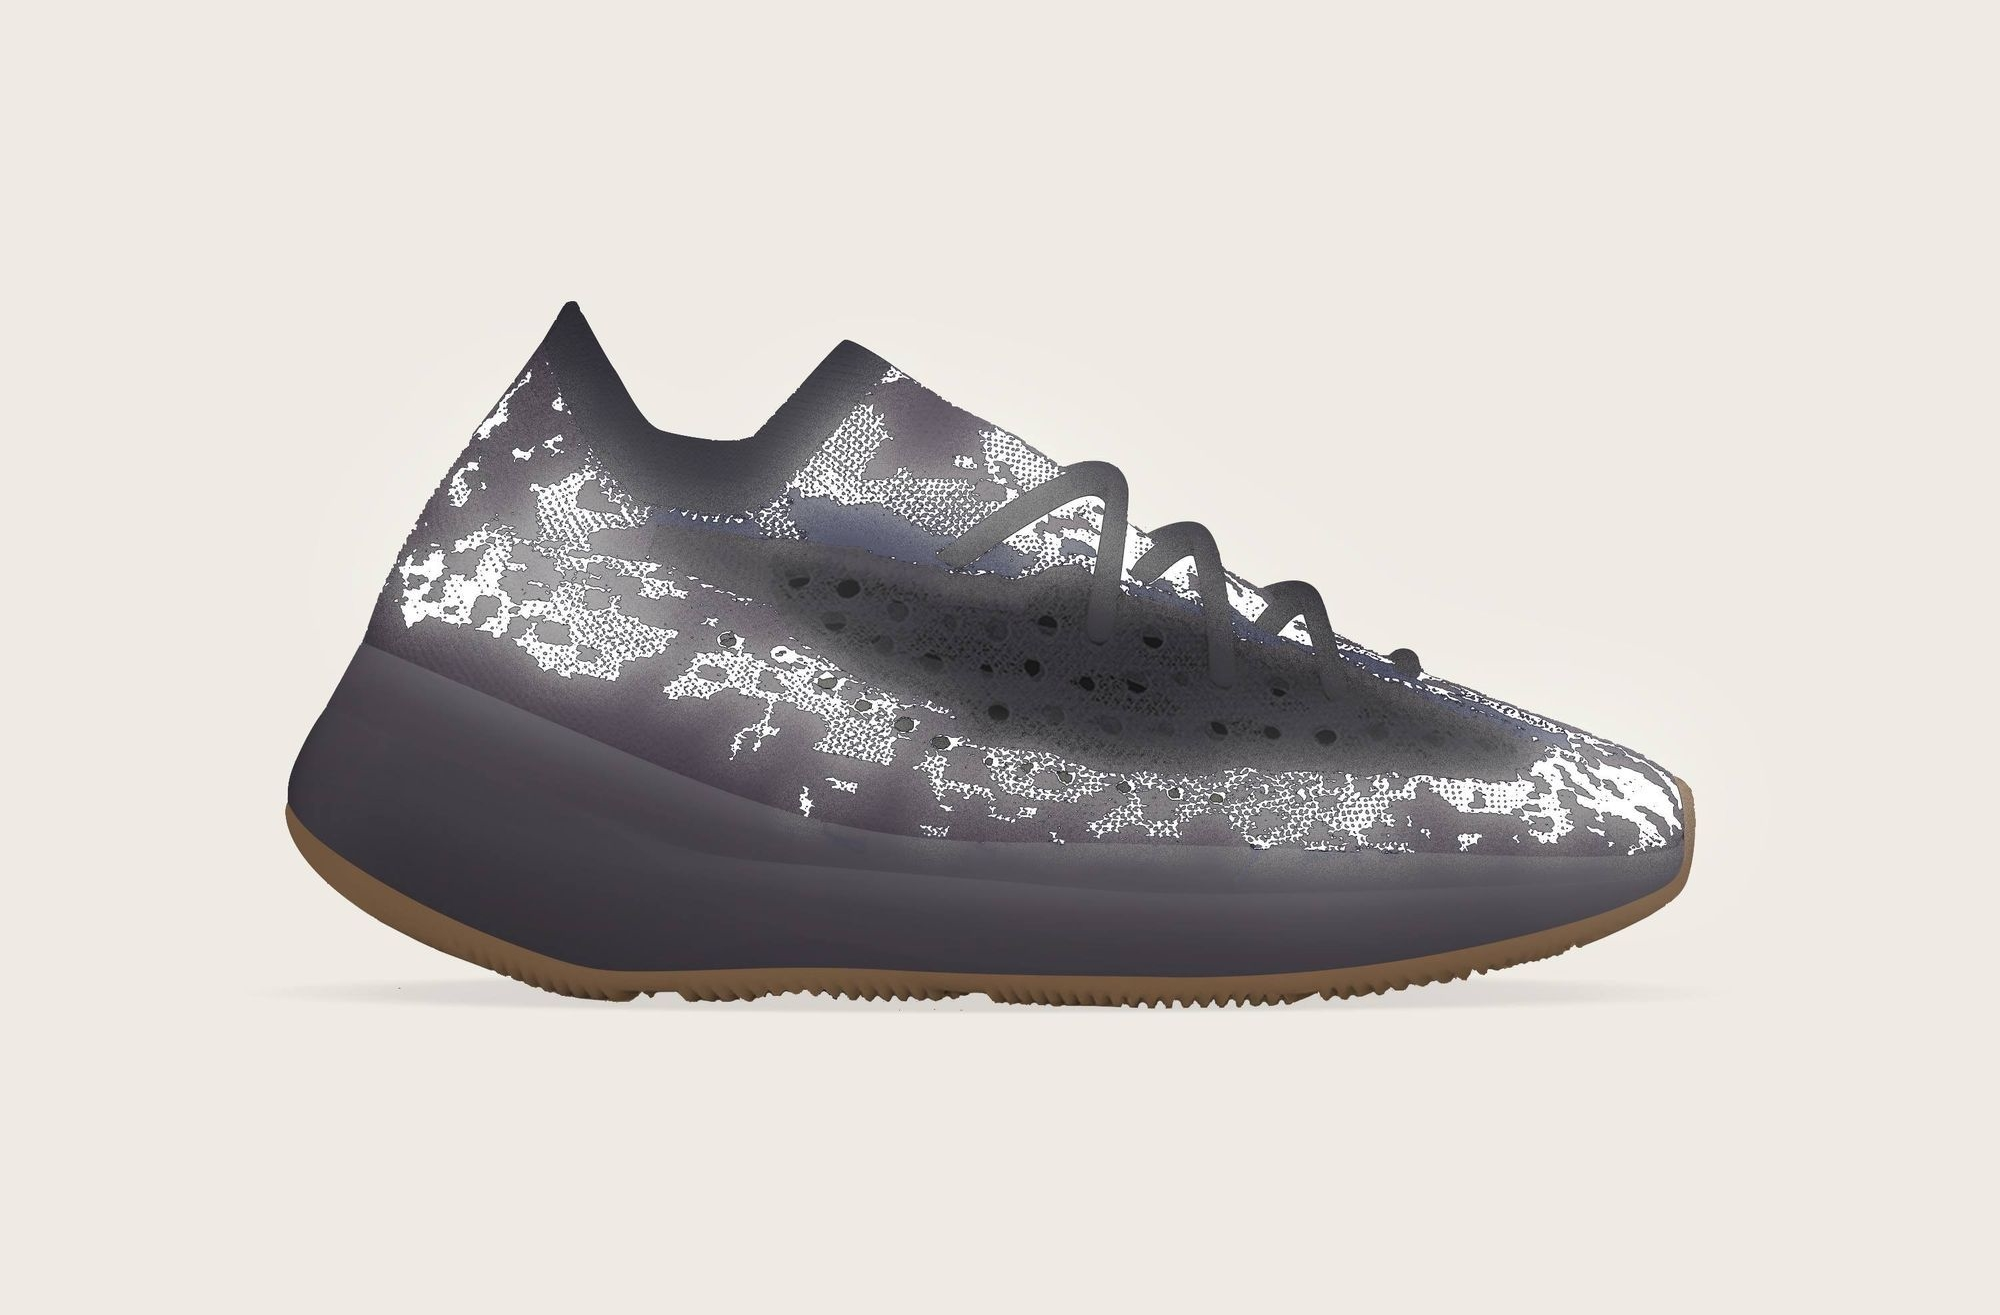 adidas Yeezy Boost 380 «Onyx»